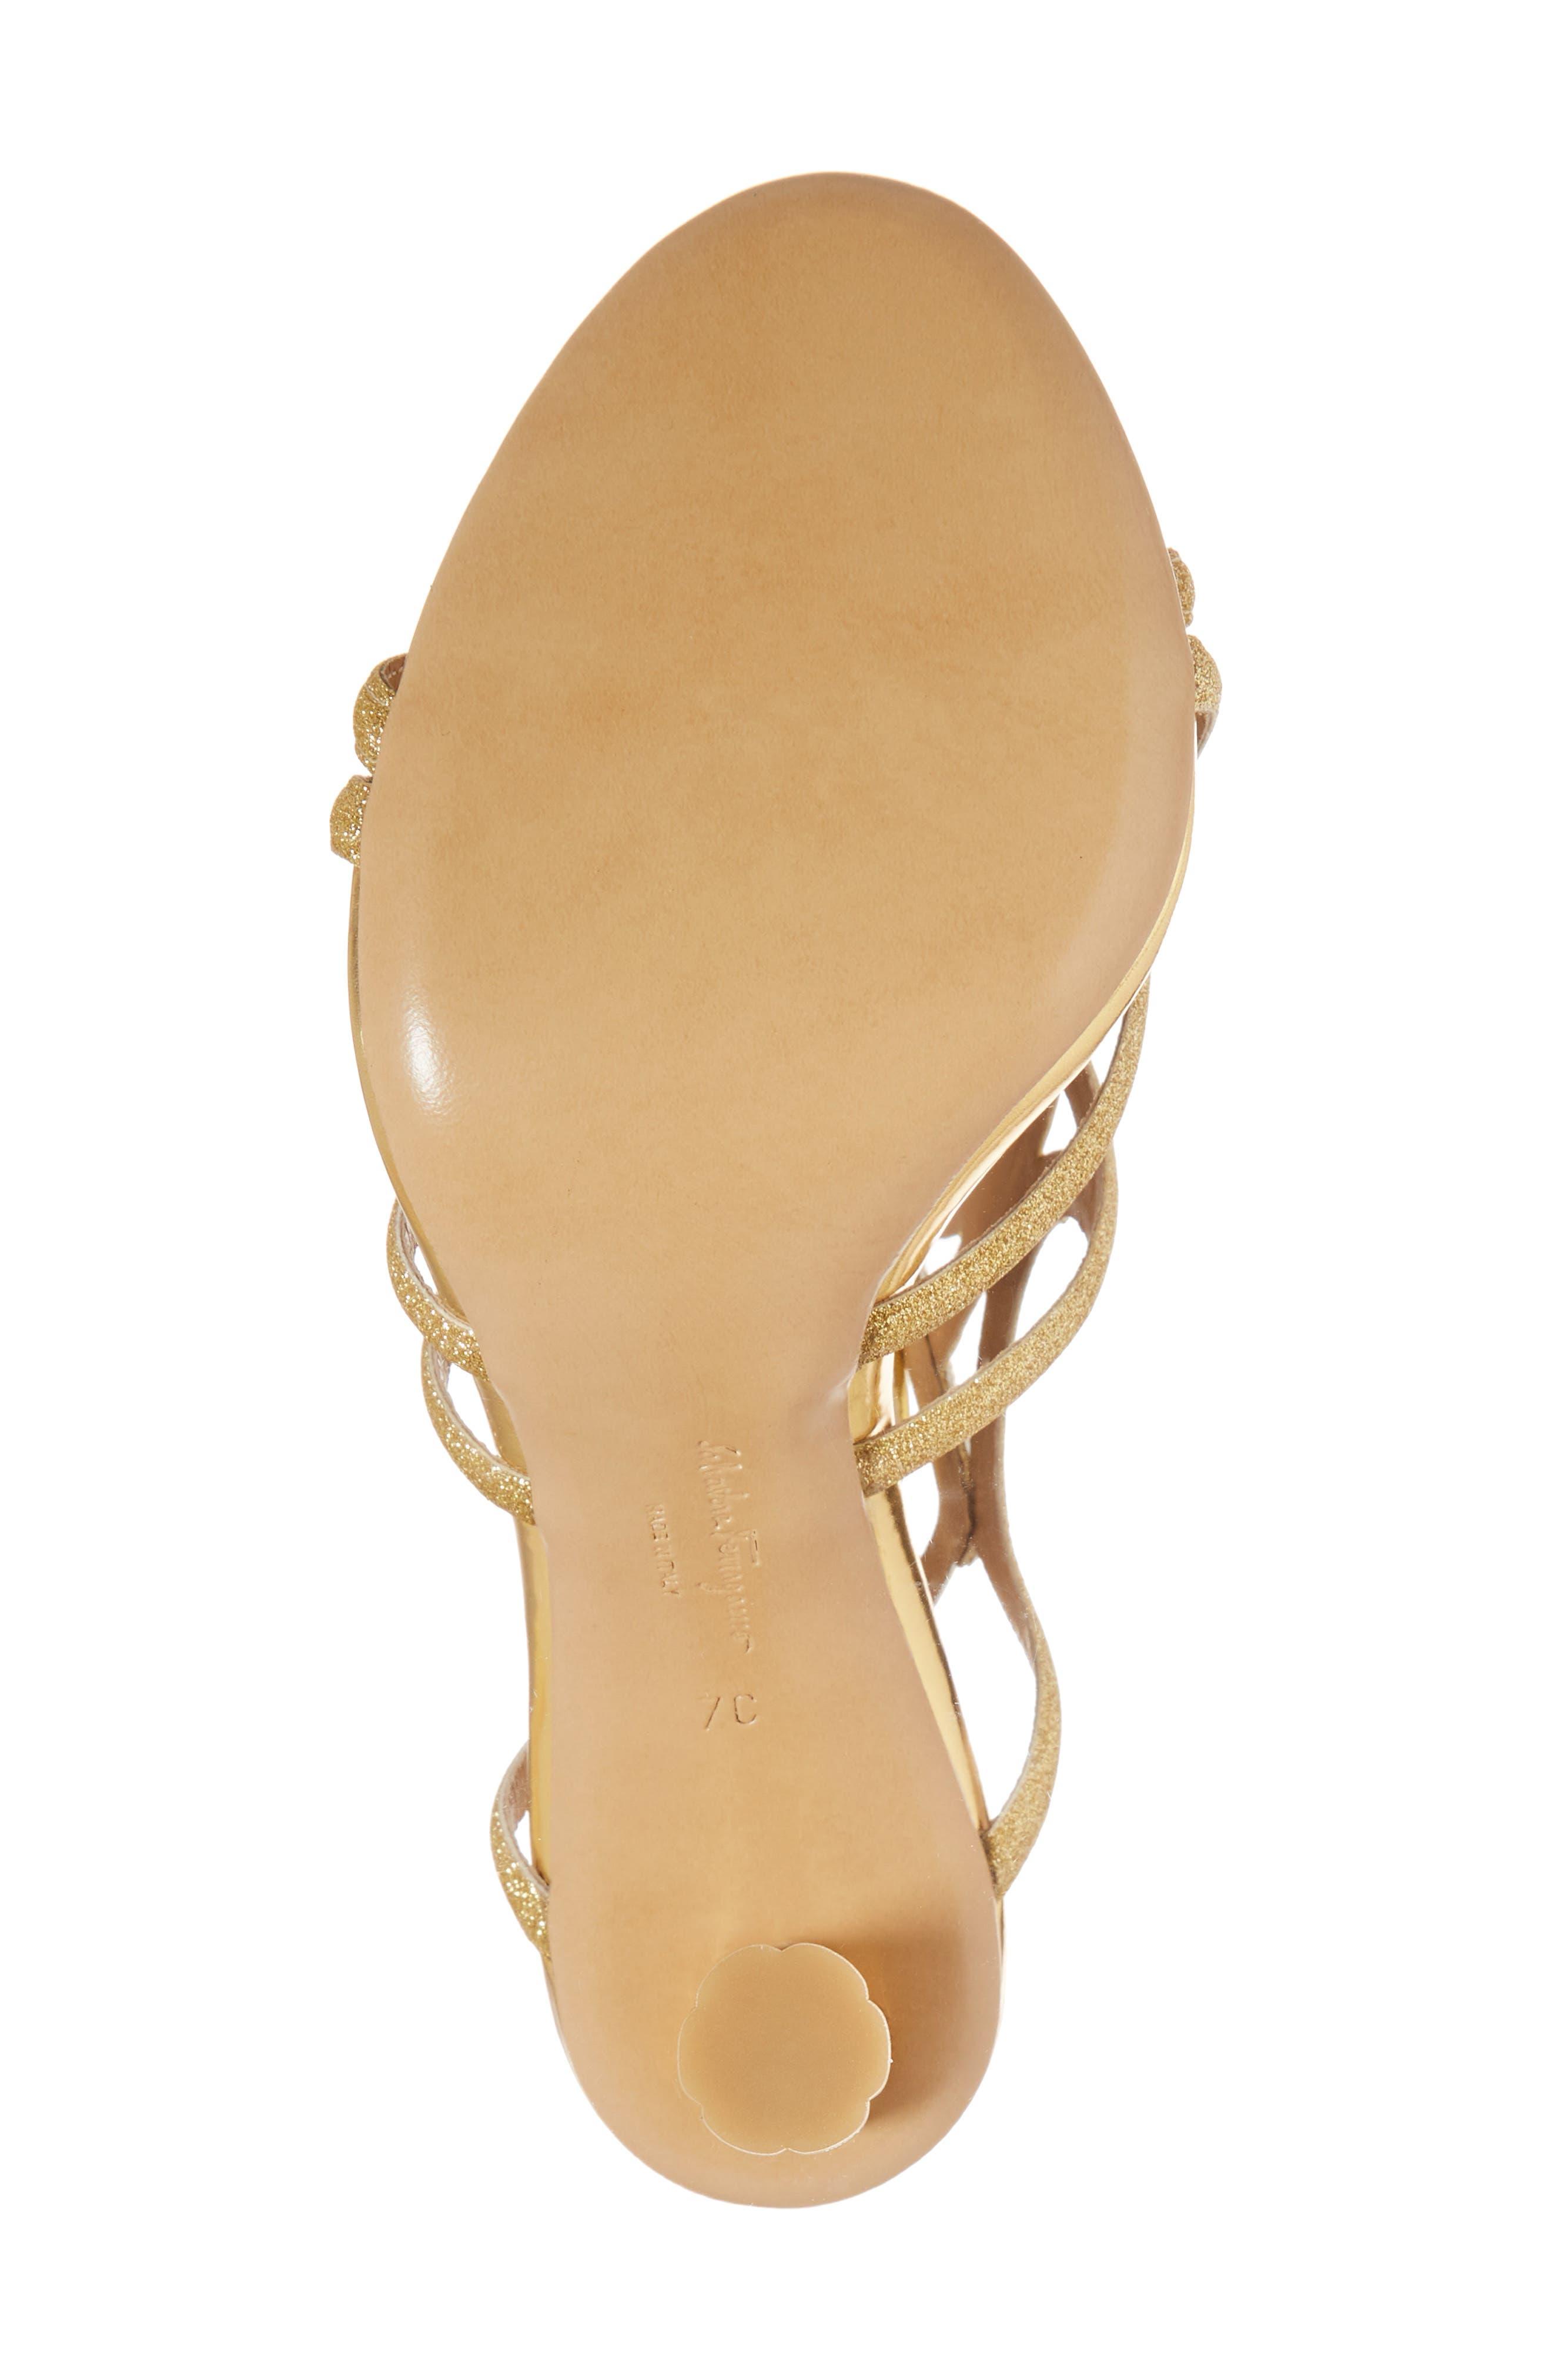 Vinci Lace-Up Heeled Sandal,                             Alternate thumbnail 6, color,                             710